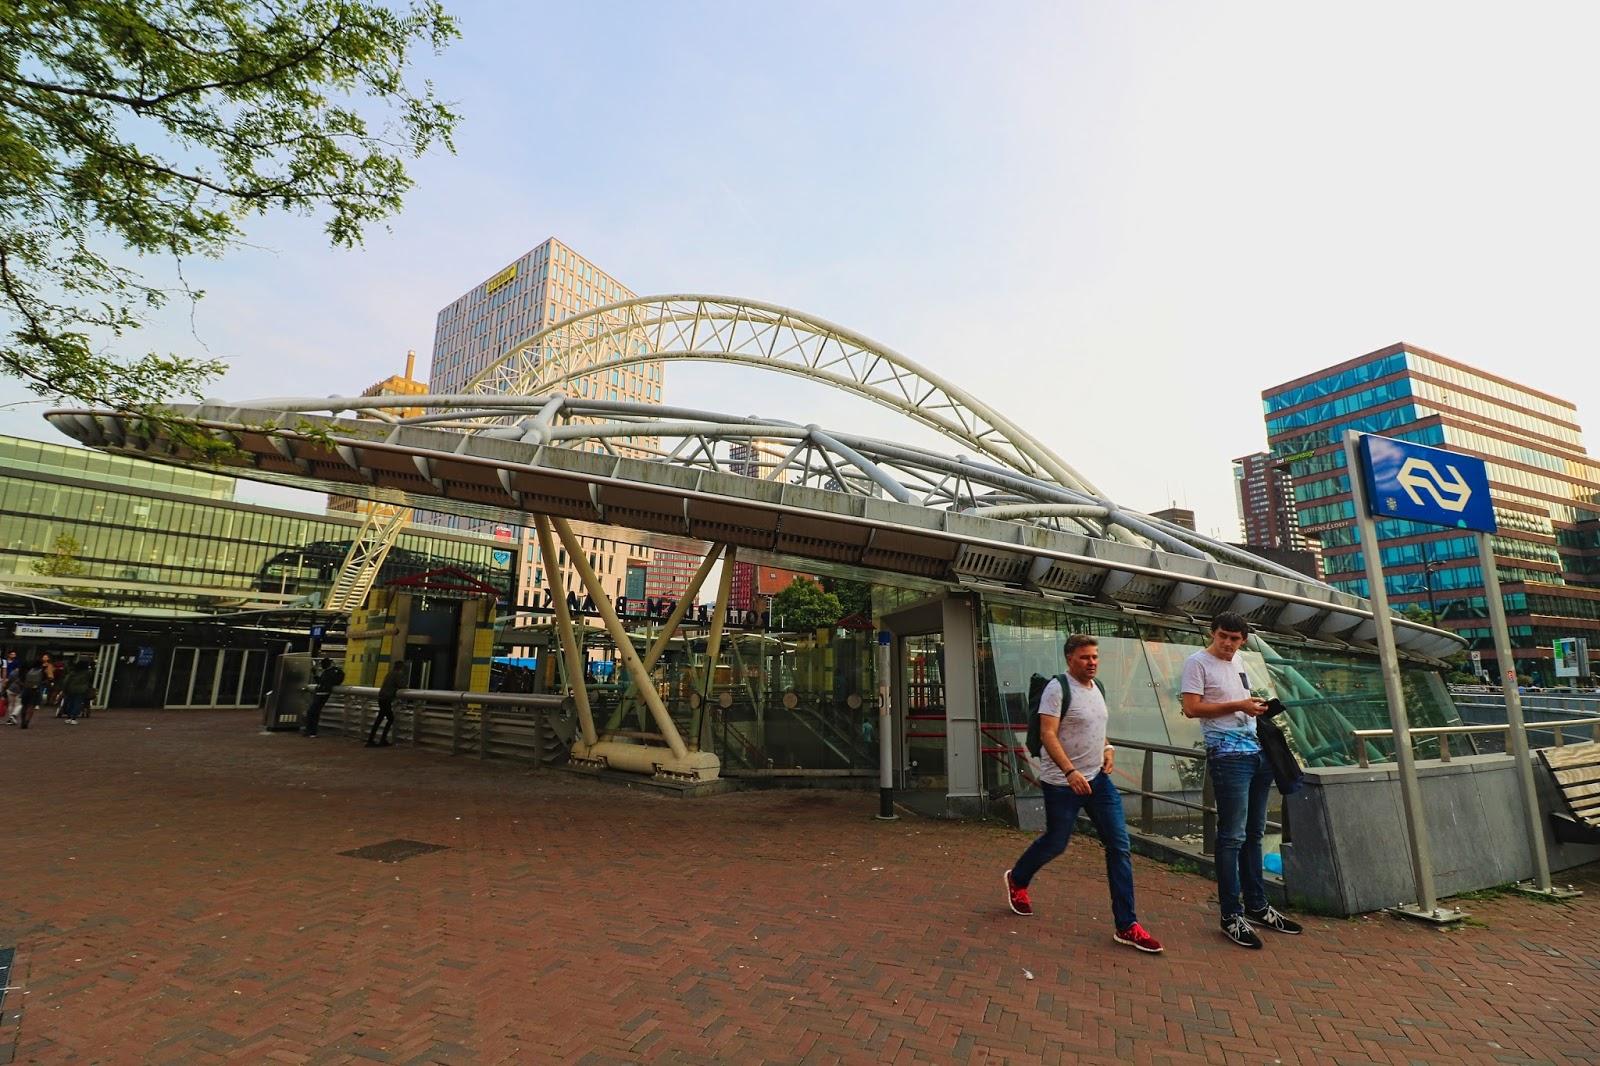 Holandia, stacja metra,